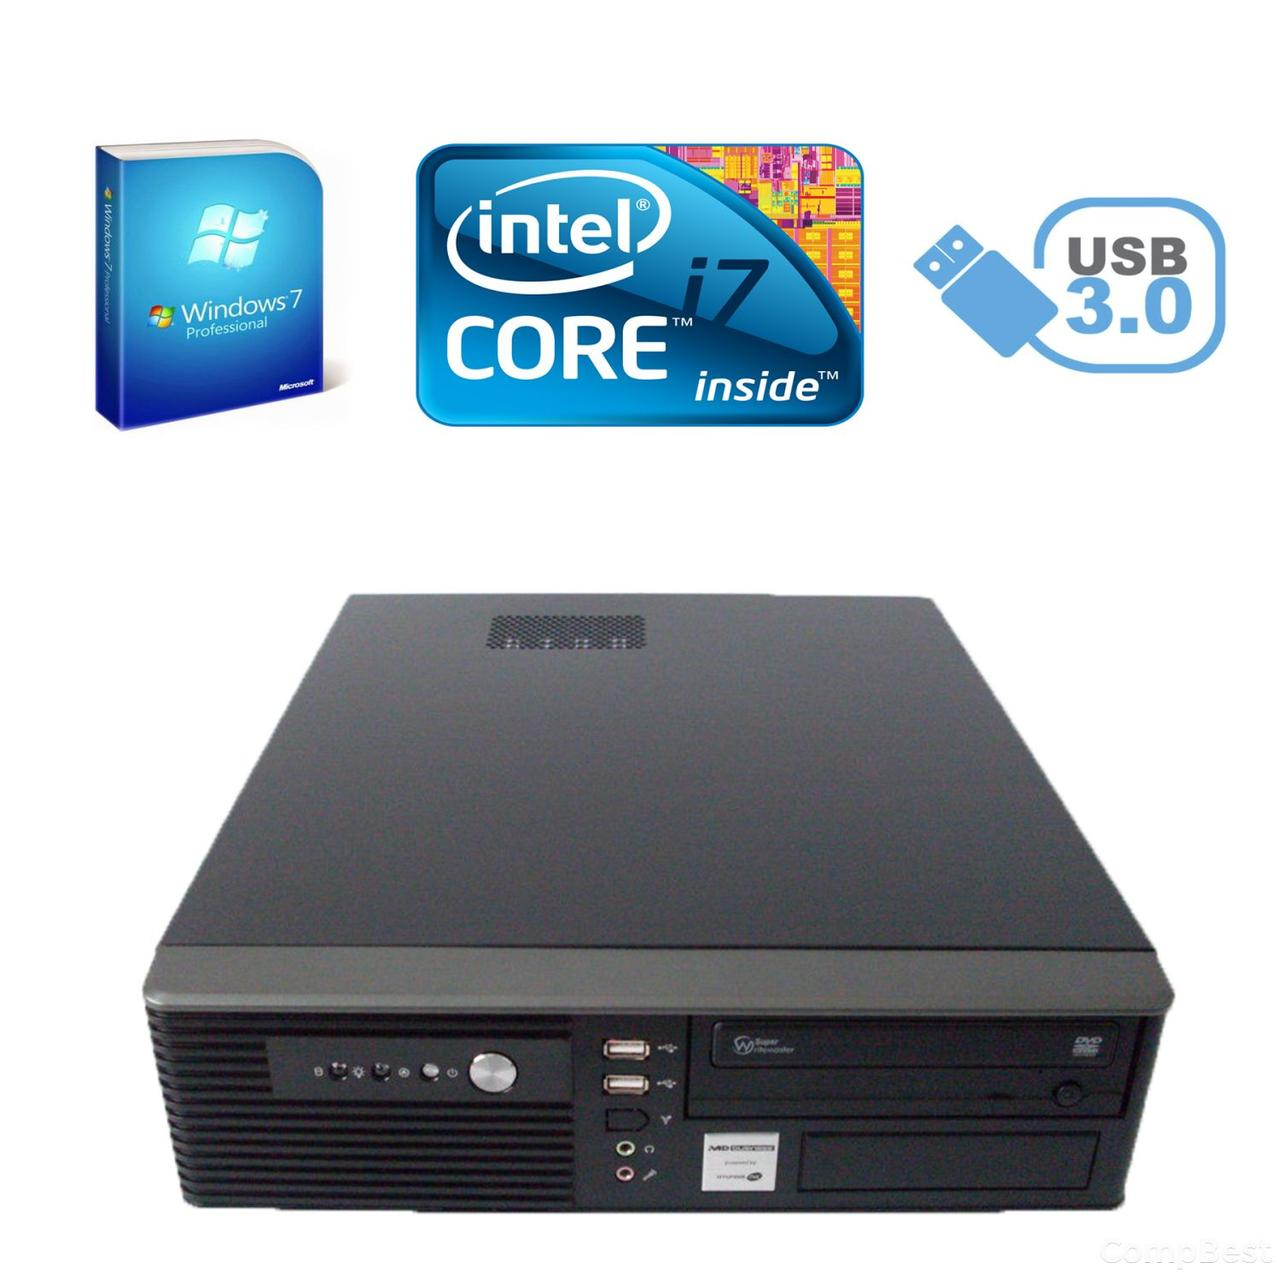 MSI SFF / Intel Core i7-2600 (4(8) ядер по 3.4-3.8GHz) / 4 GB DDR3 / 500 GB HDD / DVD привод / USB 3.0, SATA 3.0, PCI Express 3.0